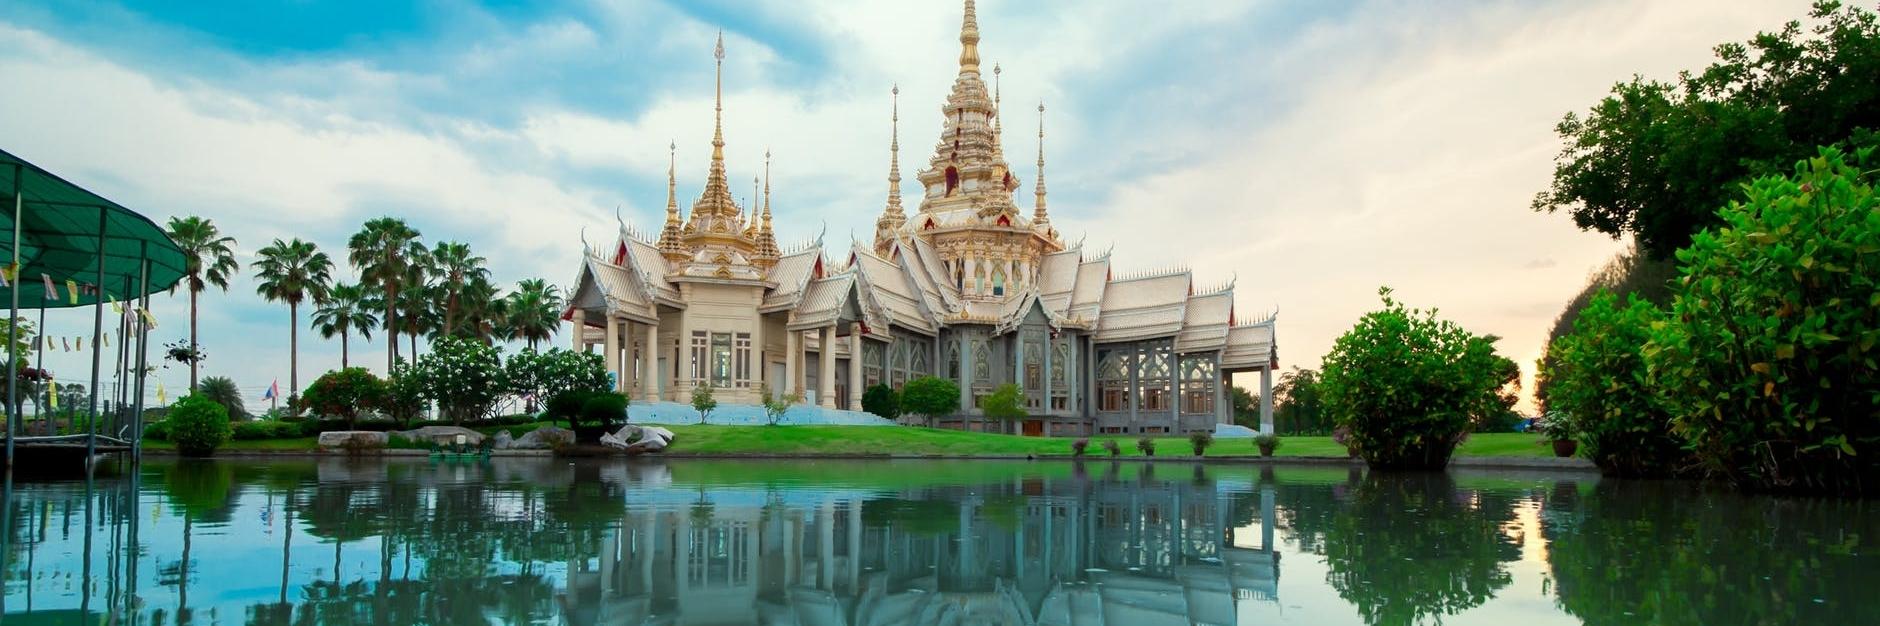 https://gody.vn/blog/bambi.chau22117889/post/cho-phien-ngoai-troi-lon-nhat-the-gioi-cho-chatuchak-o-bangkok-2163